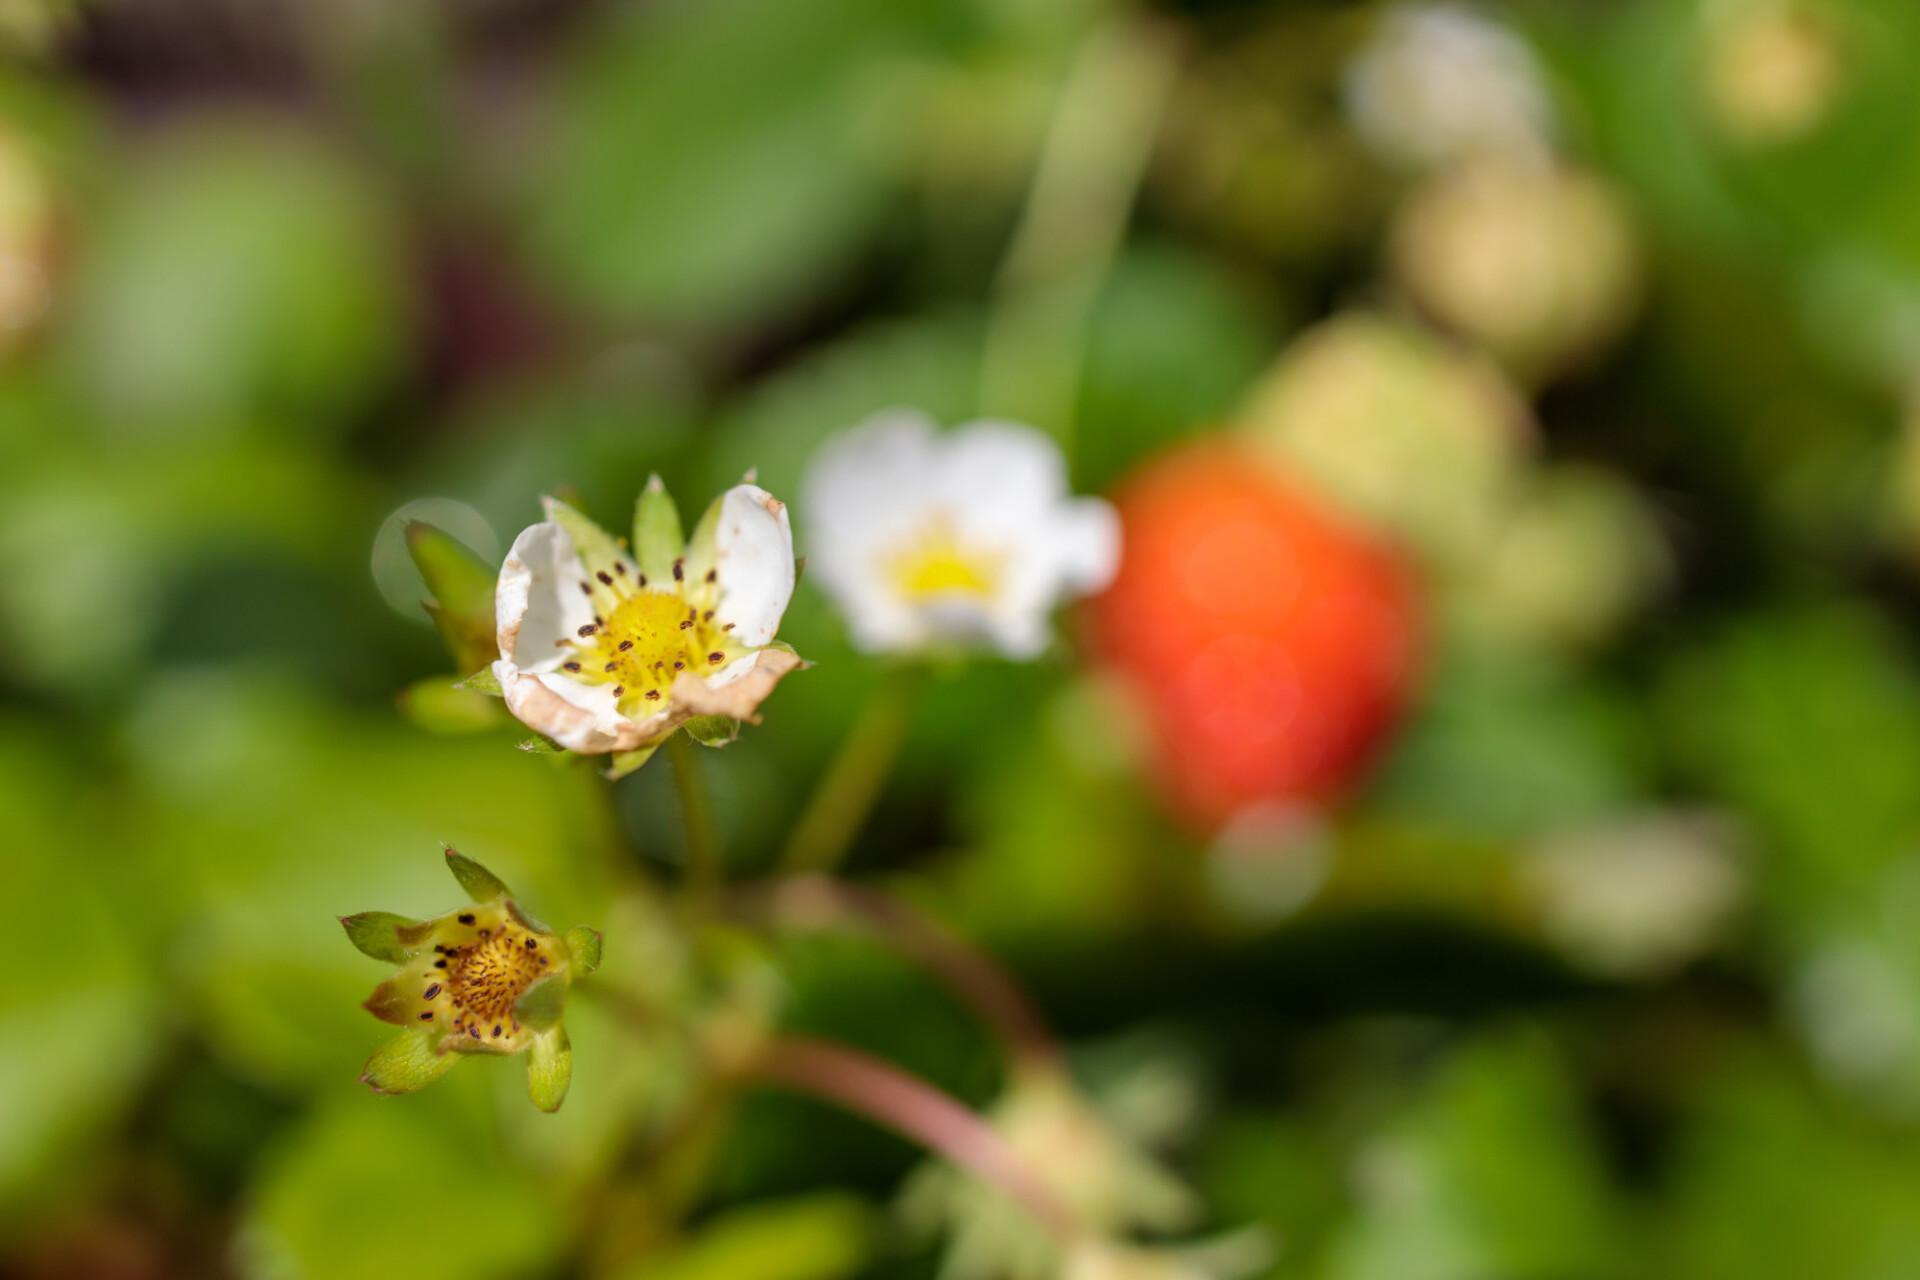 The white blossom of a strawberry